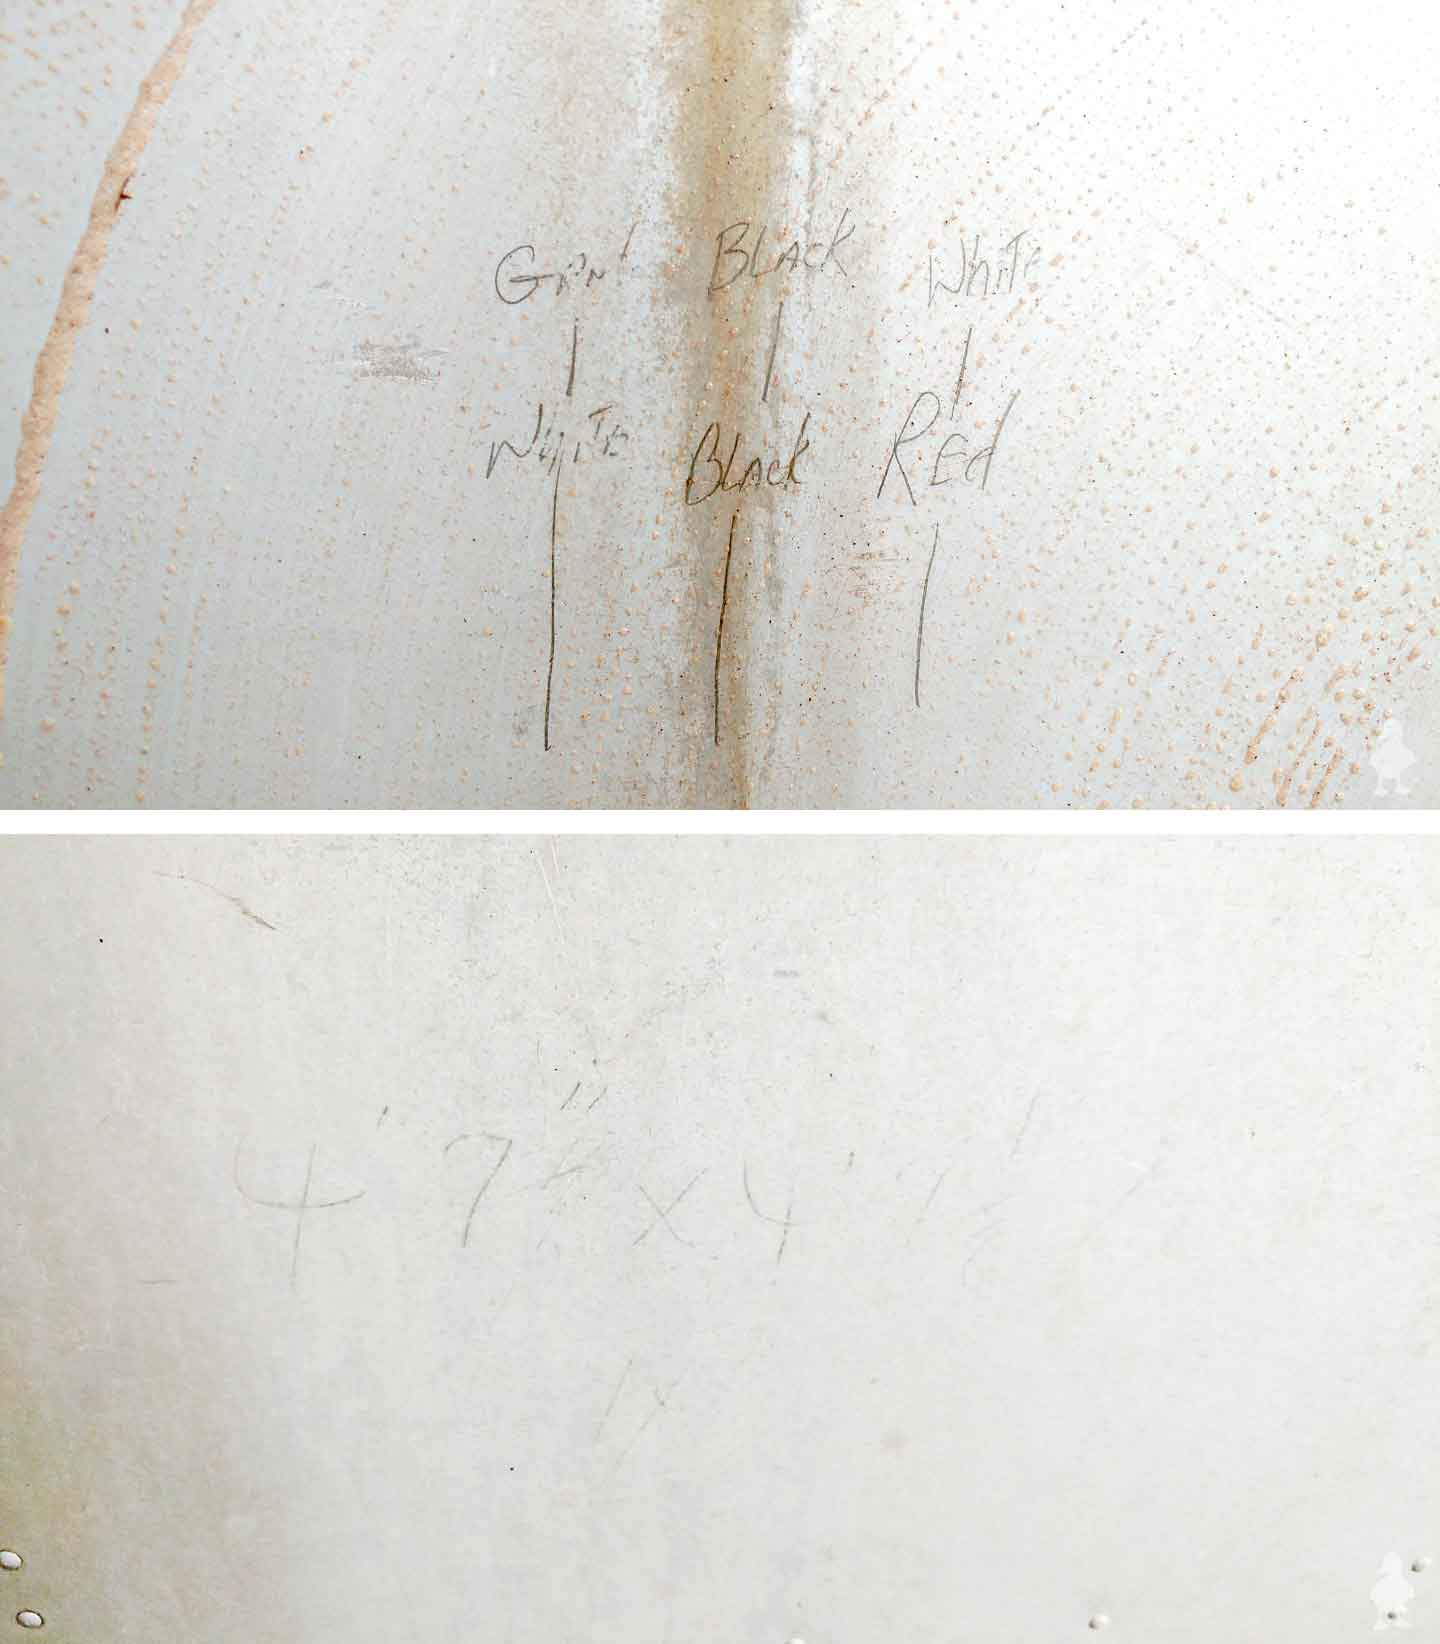 closeups of handwritten measurements on exterior of vintage camper trailer